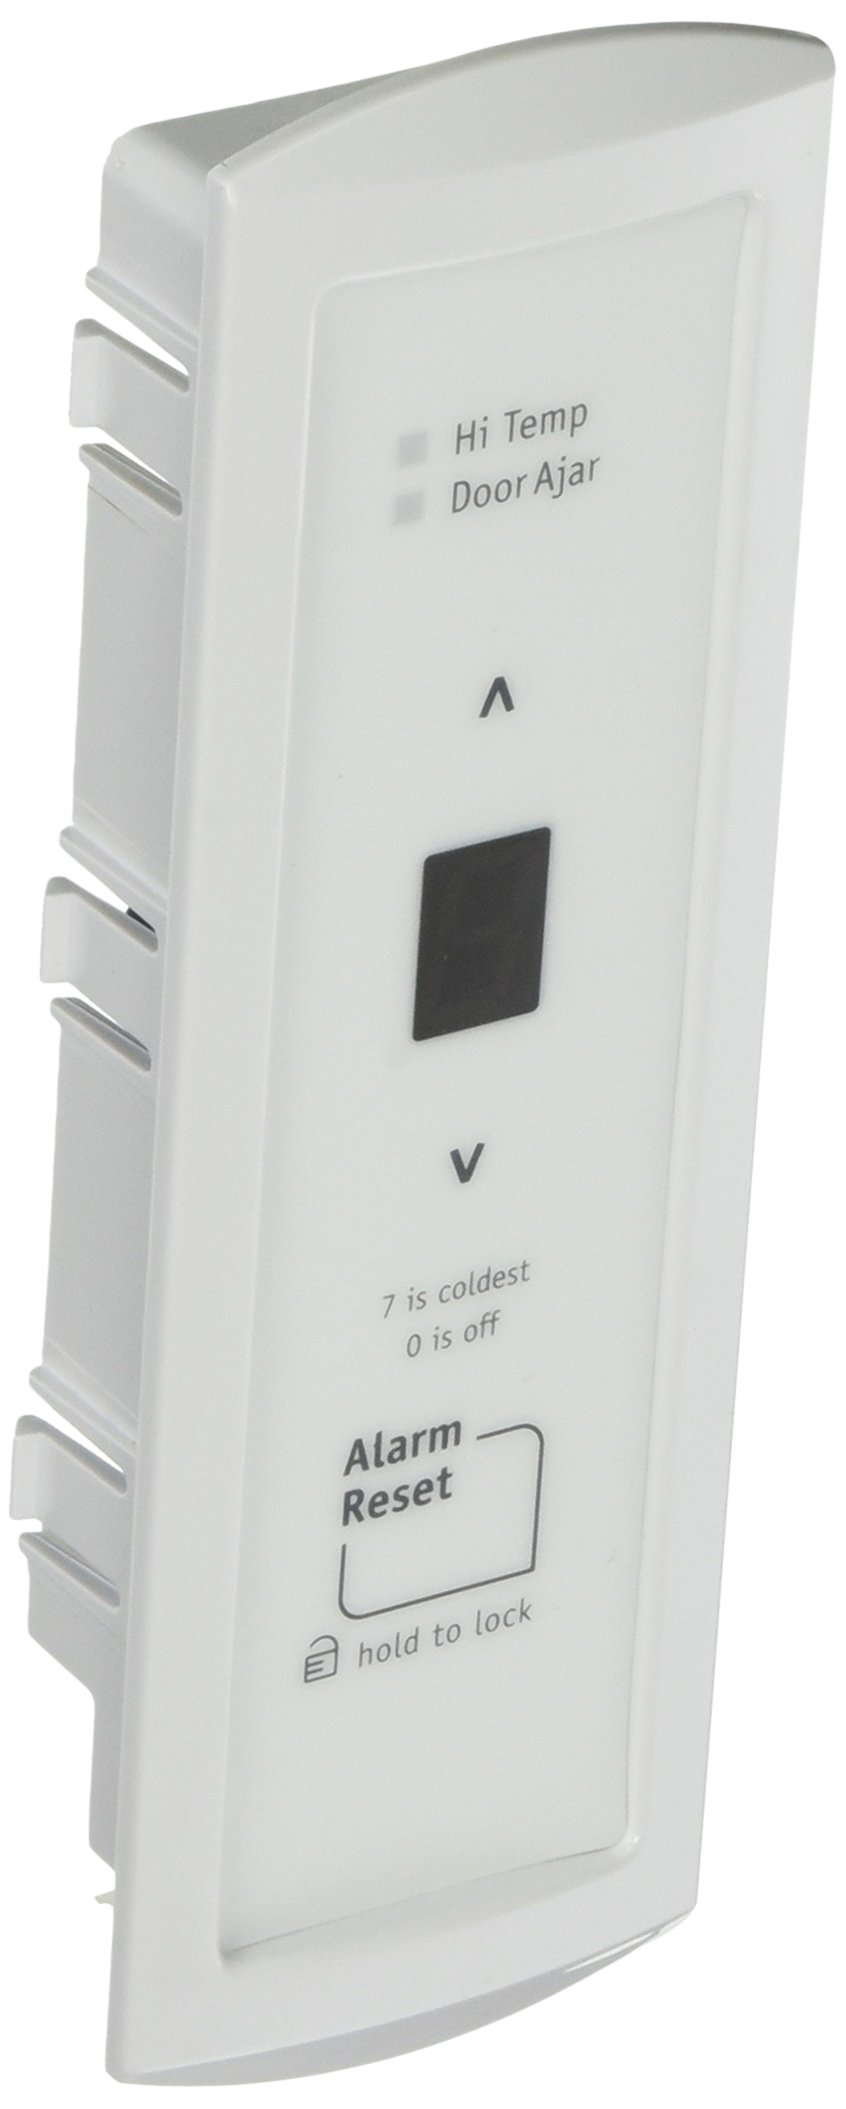 FRIGIDAIRE 297370600 Electronic Control